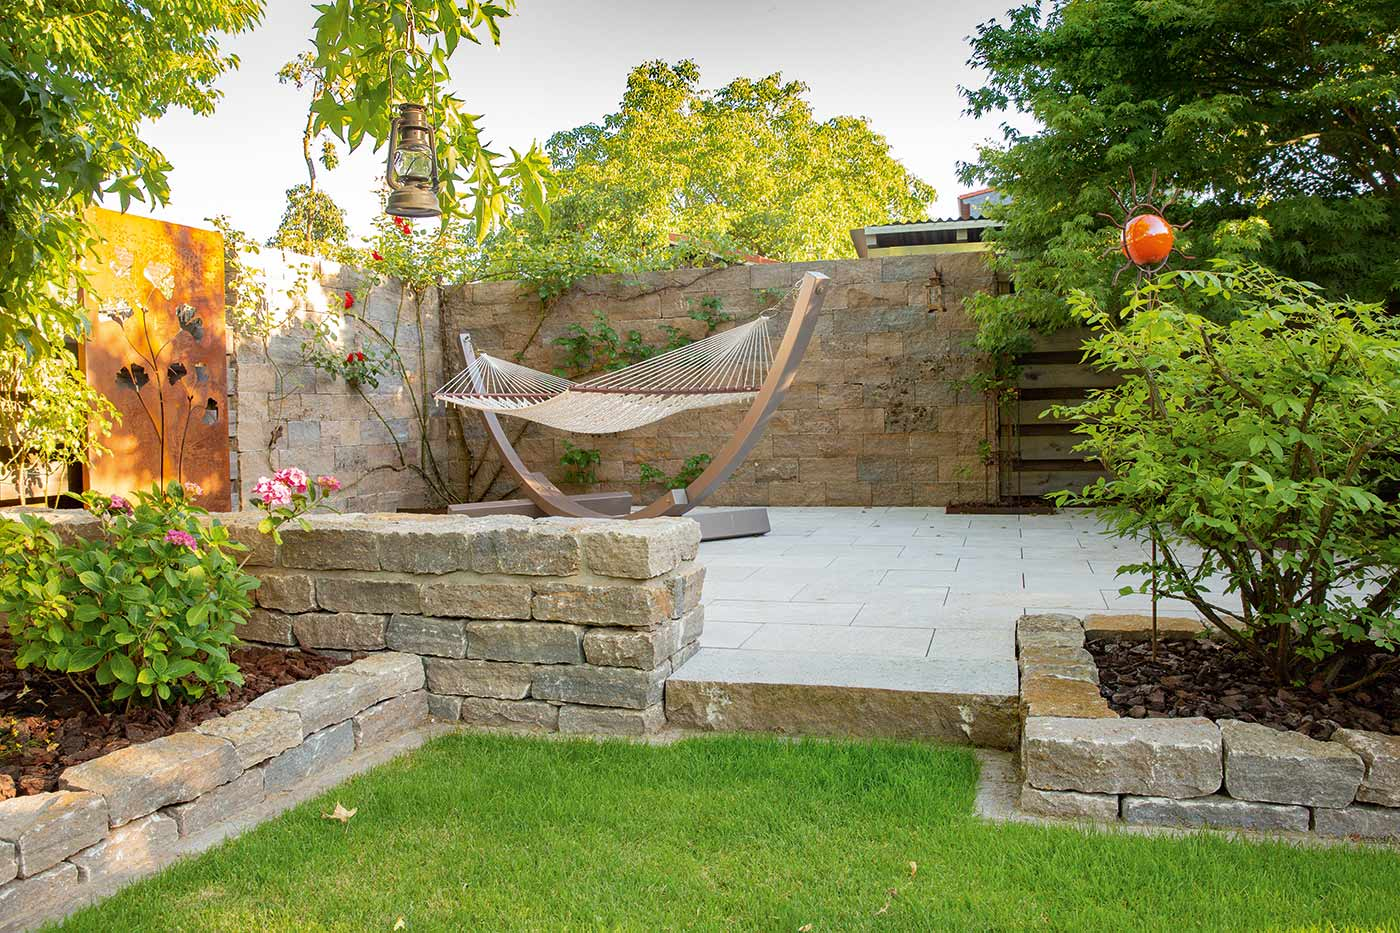 Romantischer Garten Hängematte Umgebung